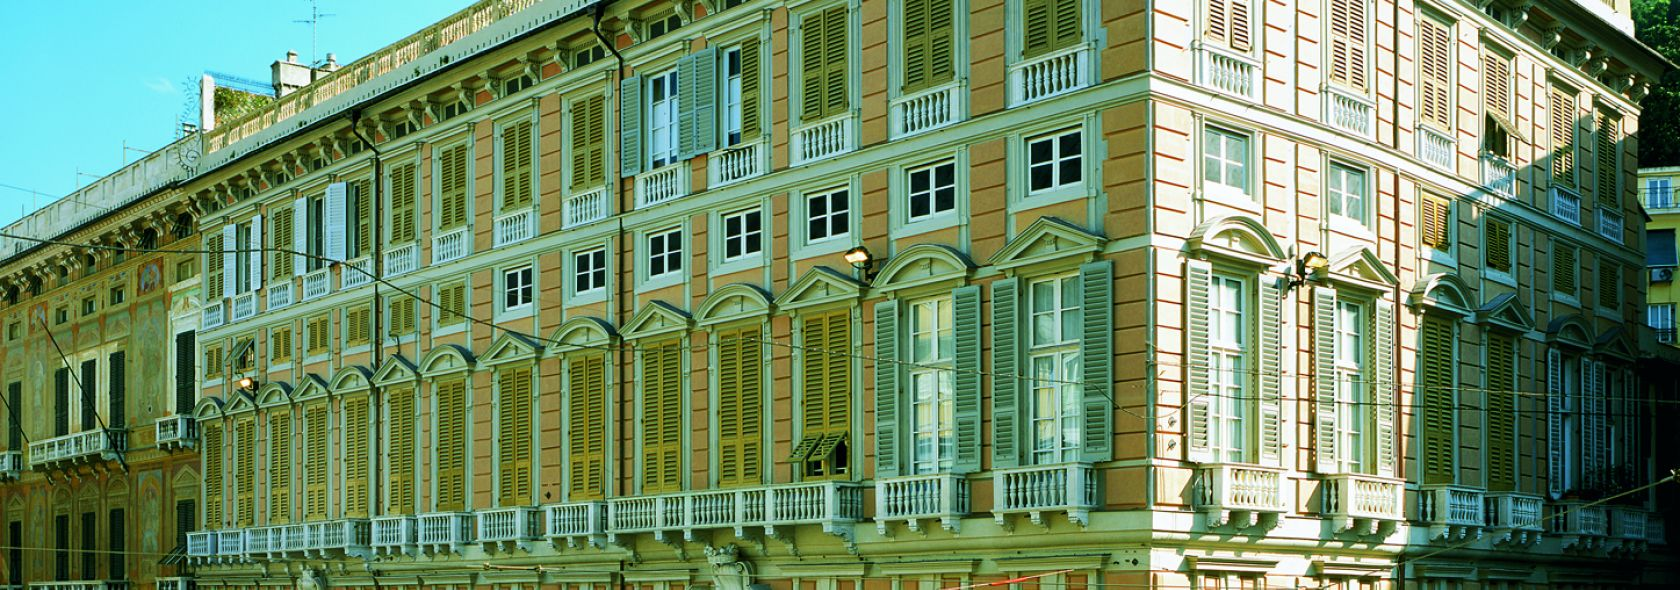 Palazzo Agostino Ayrolo, poi Negrone